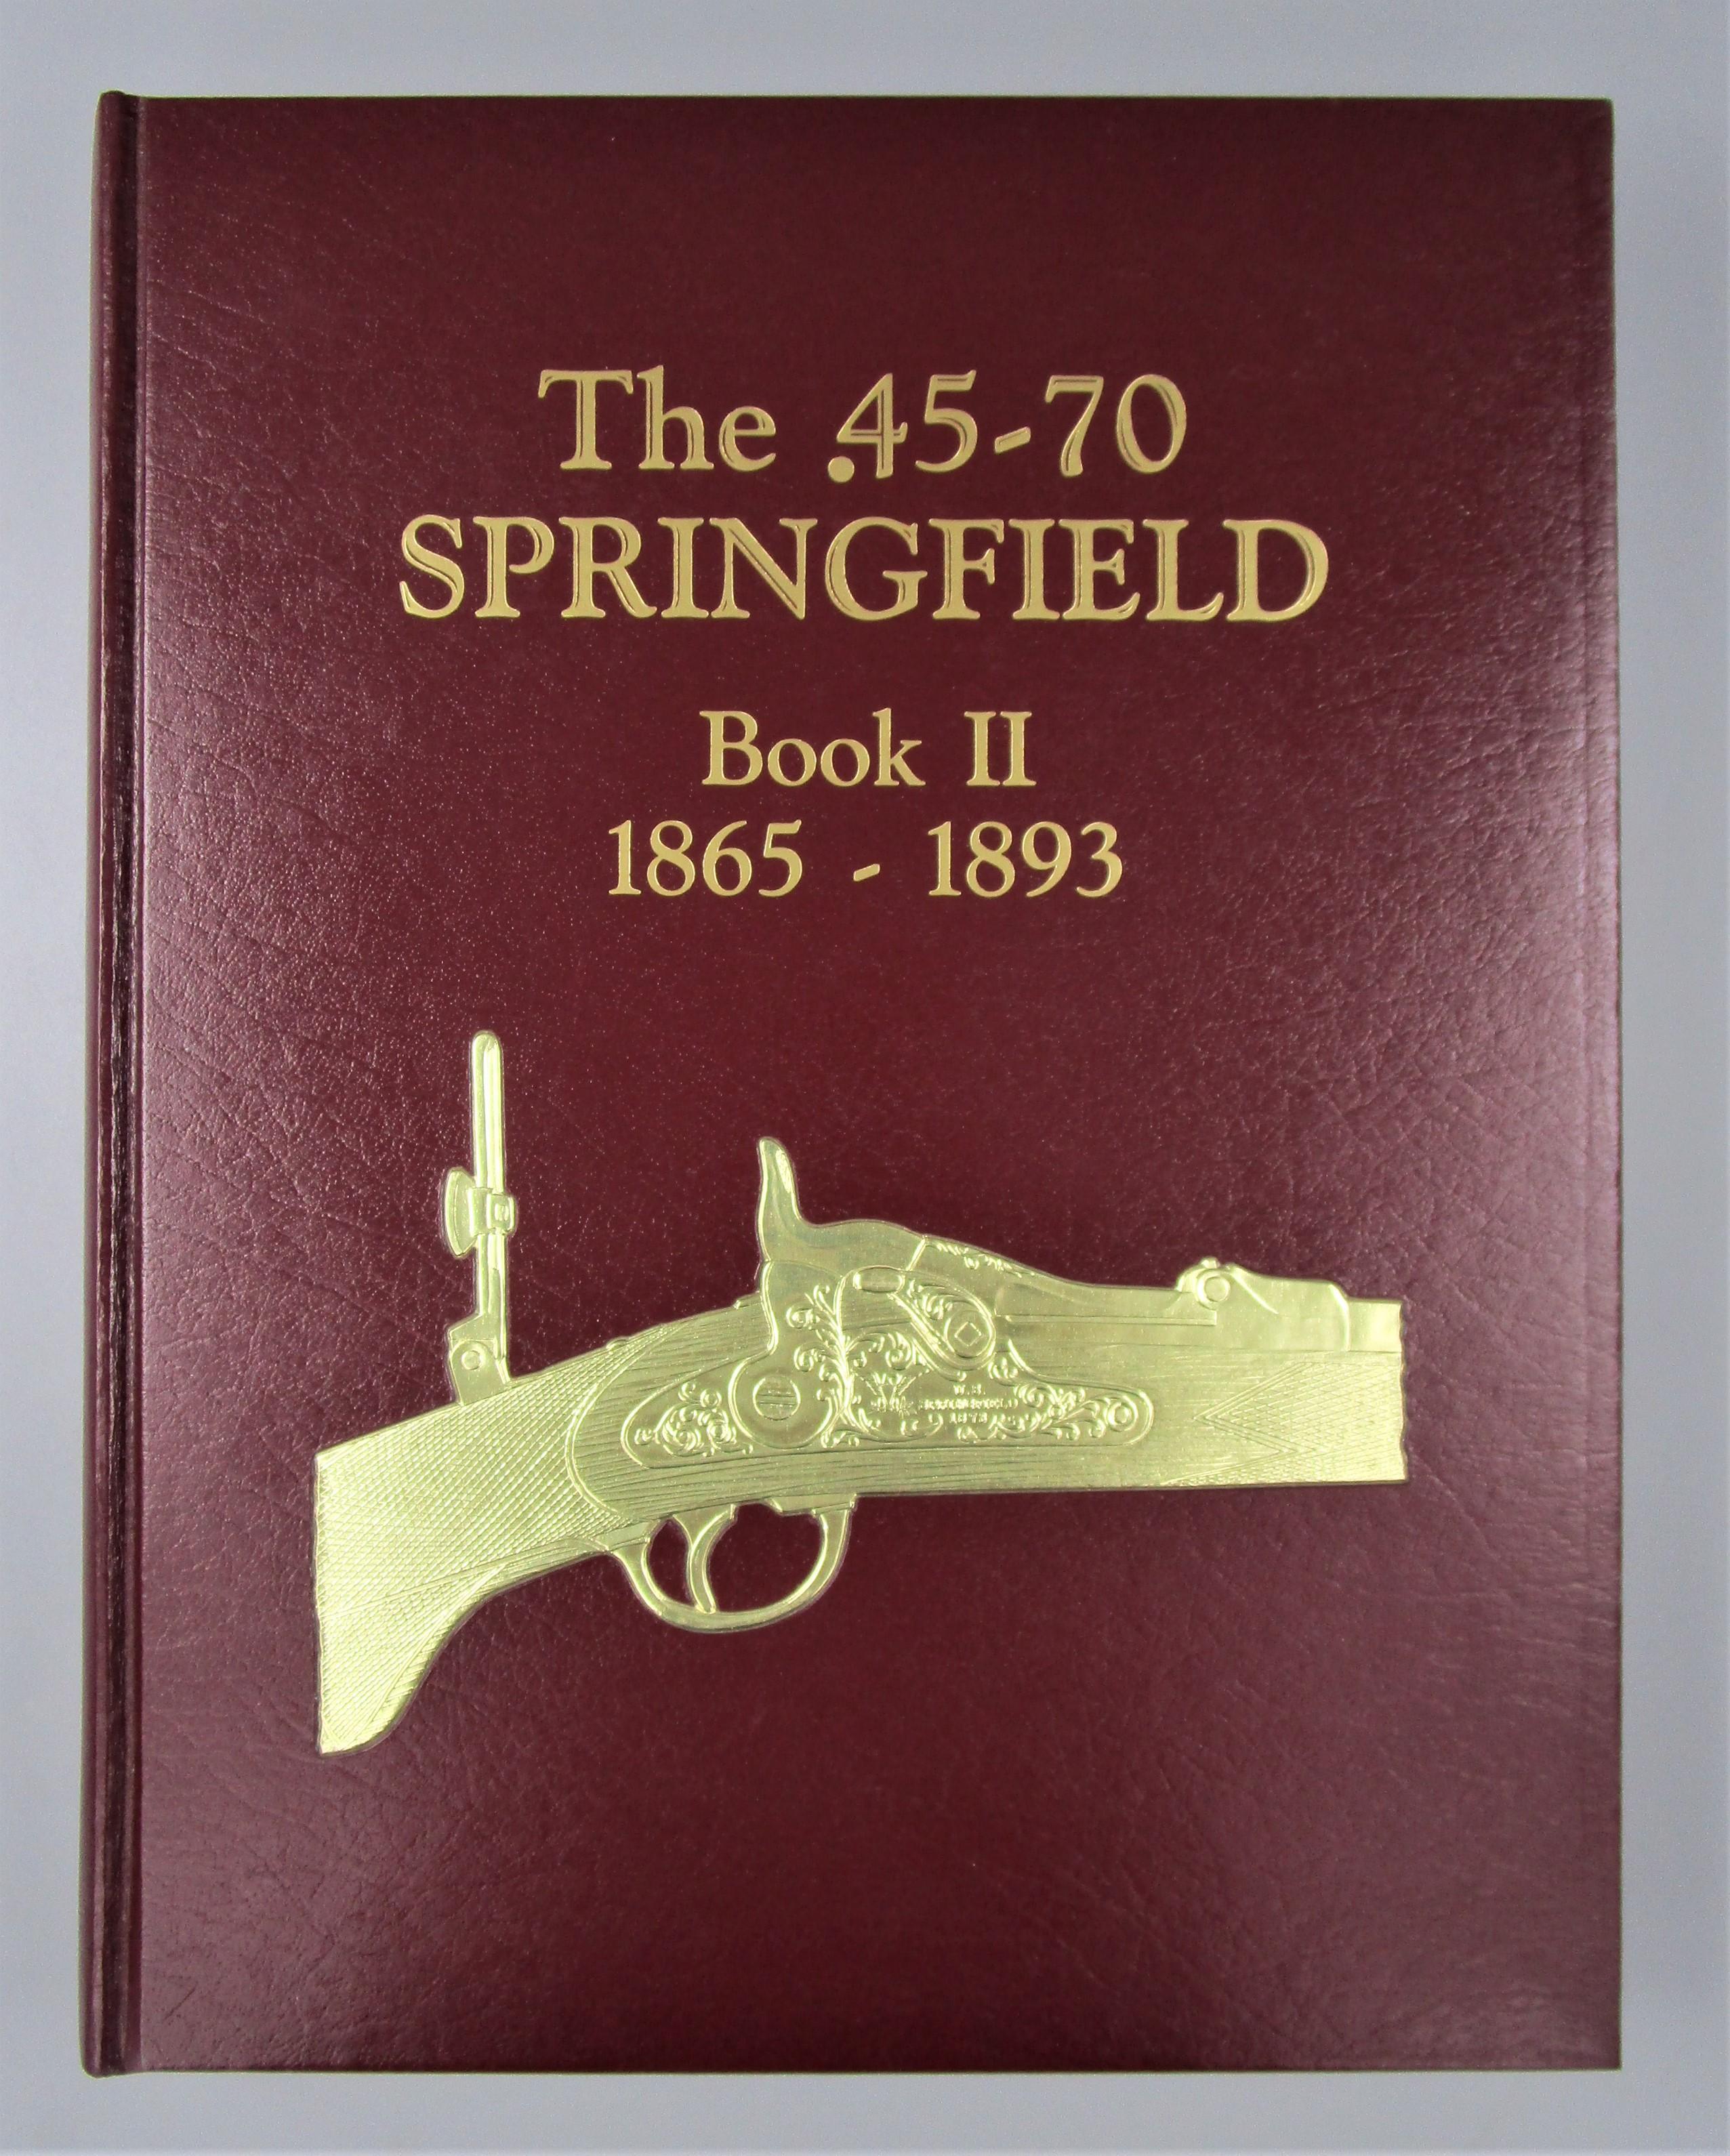 THE .45-70 SPRINGFIELD BOOK II, by Albert J. Frasca, Ph.D. - 1997